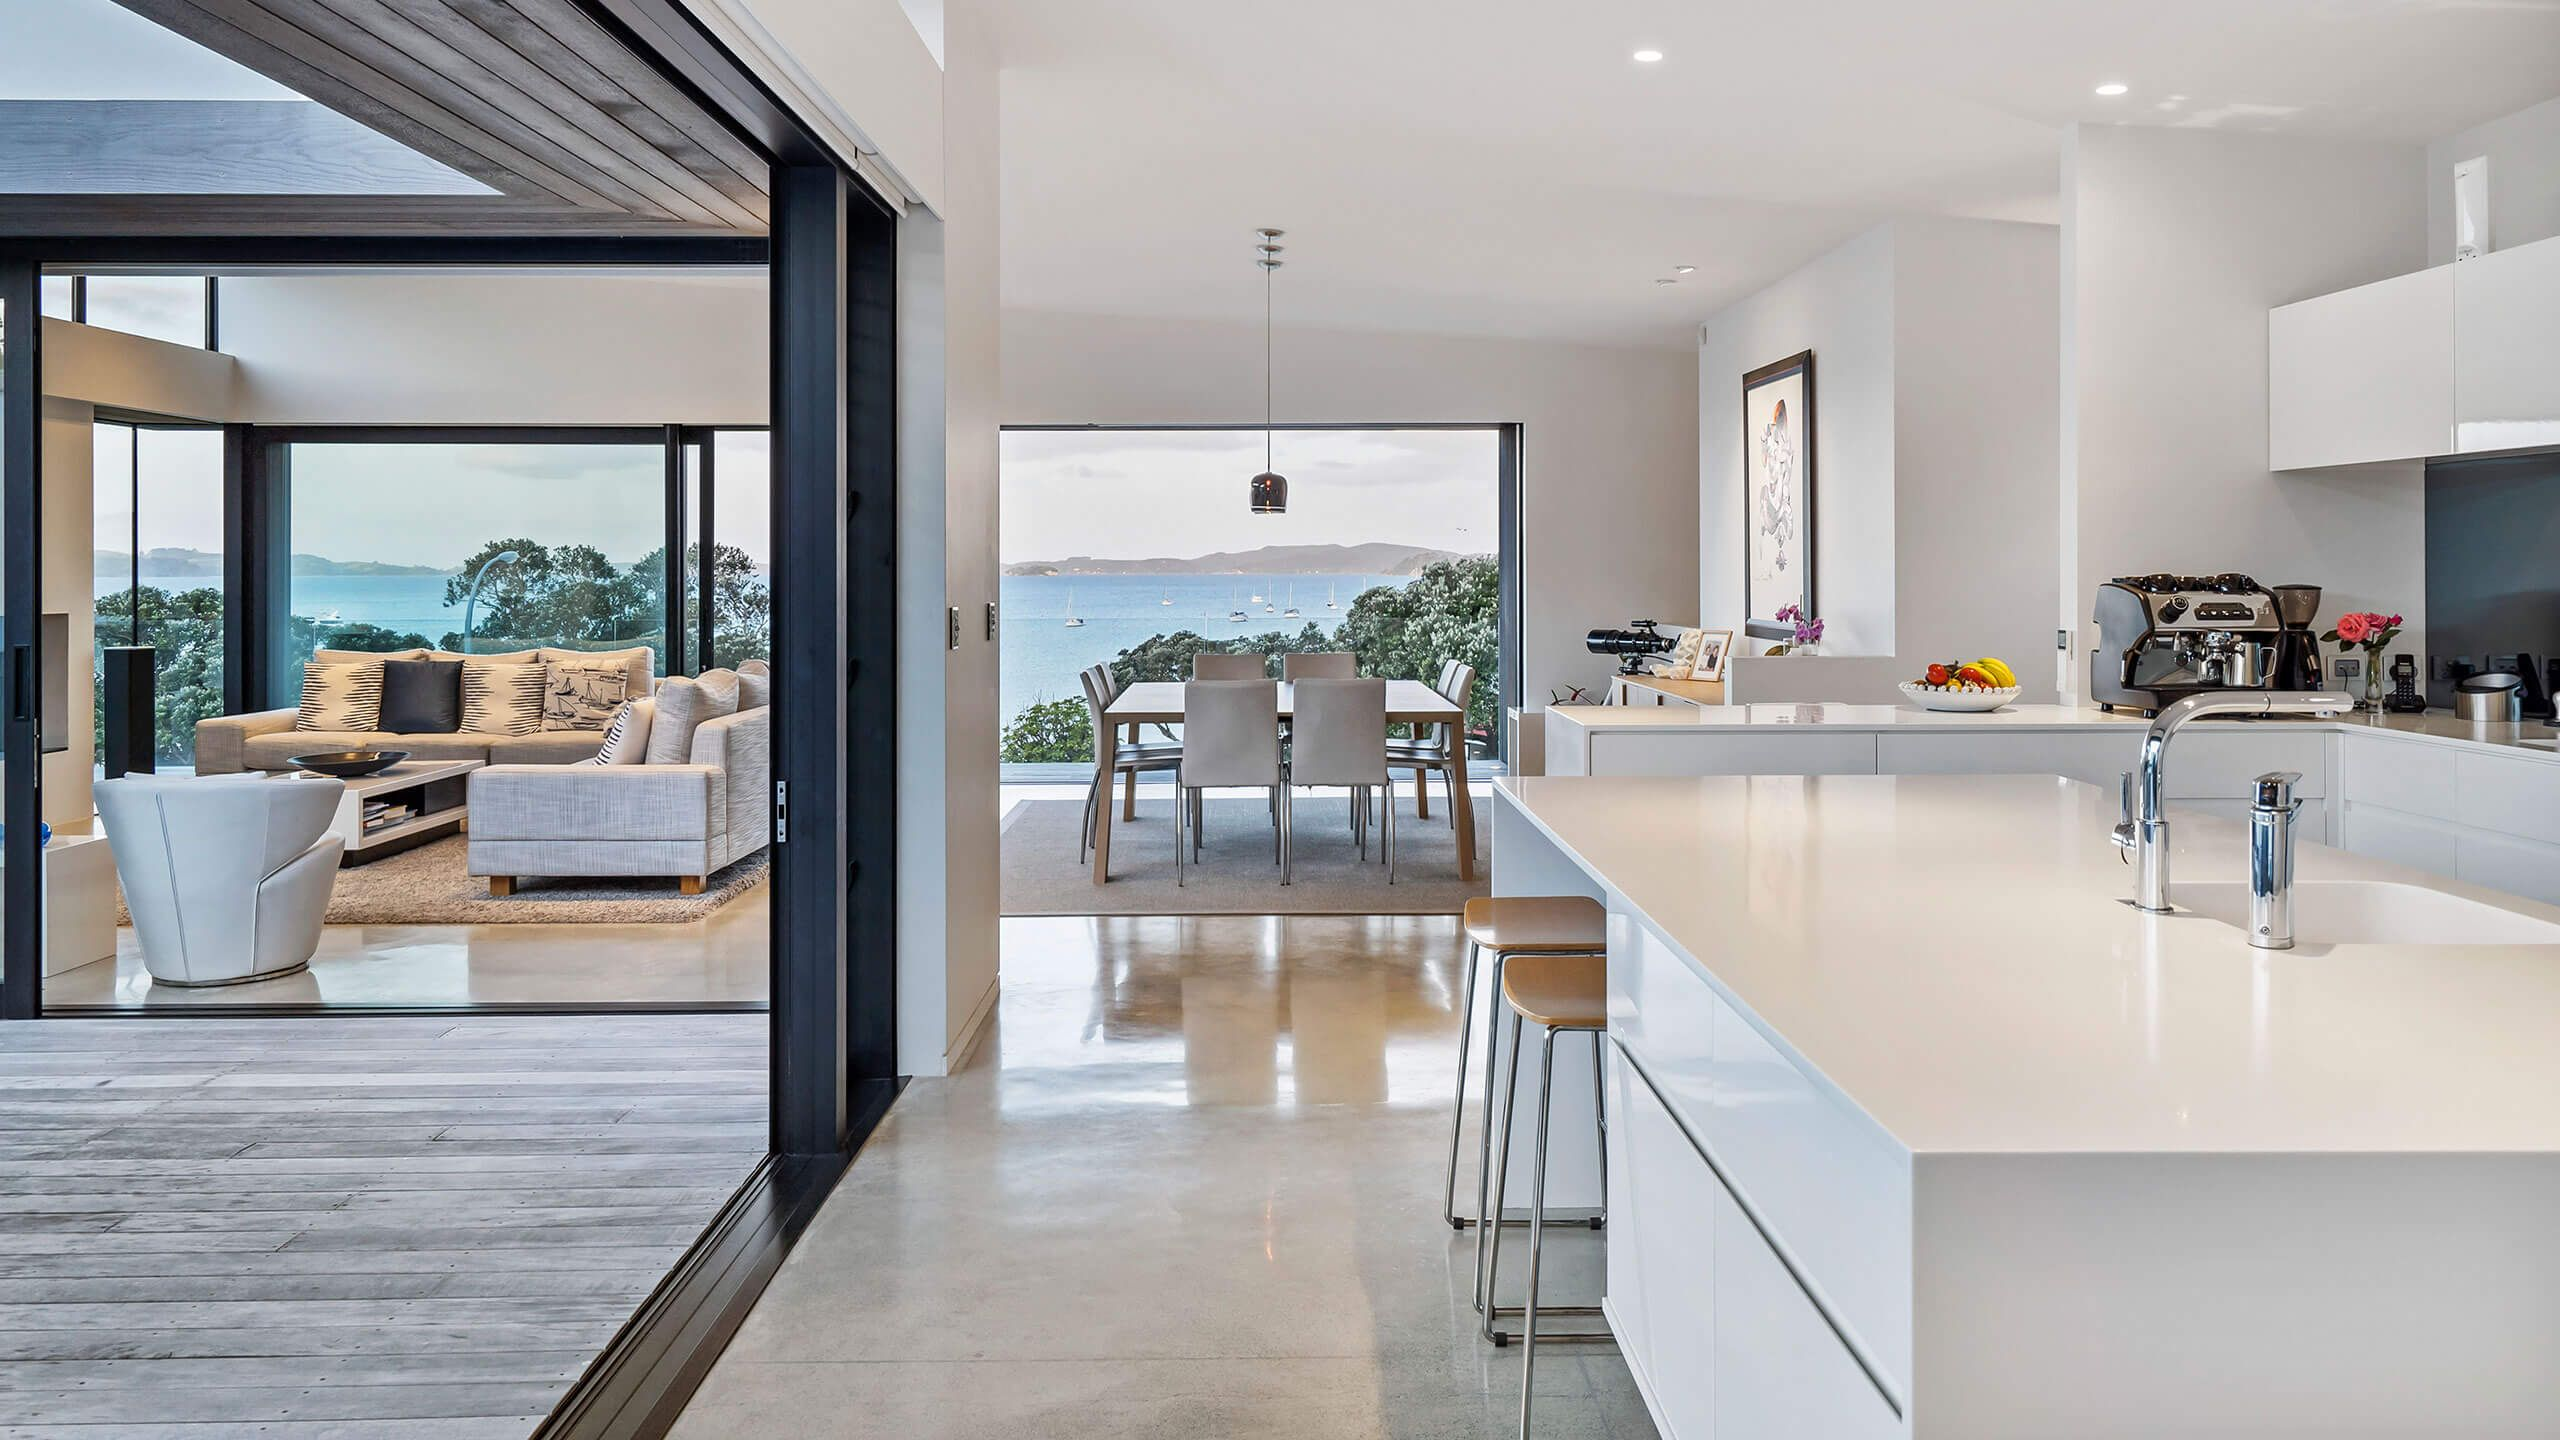 Kitchen Flooring Ideas Nz In 2020 Floor Design Concrete Floors Concrete Floors Living Room